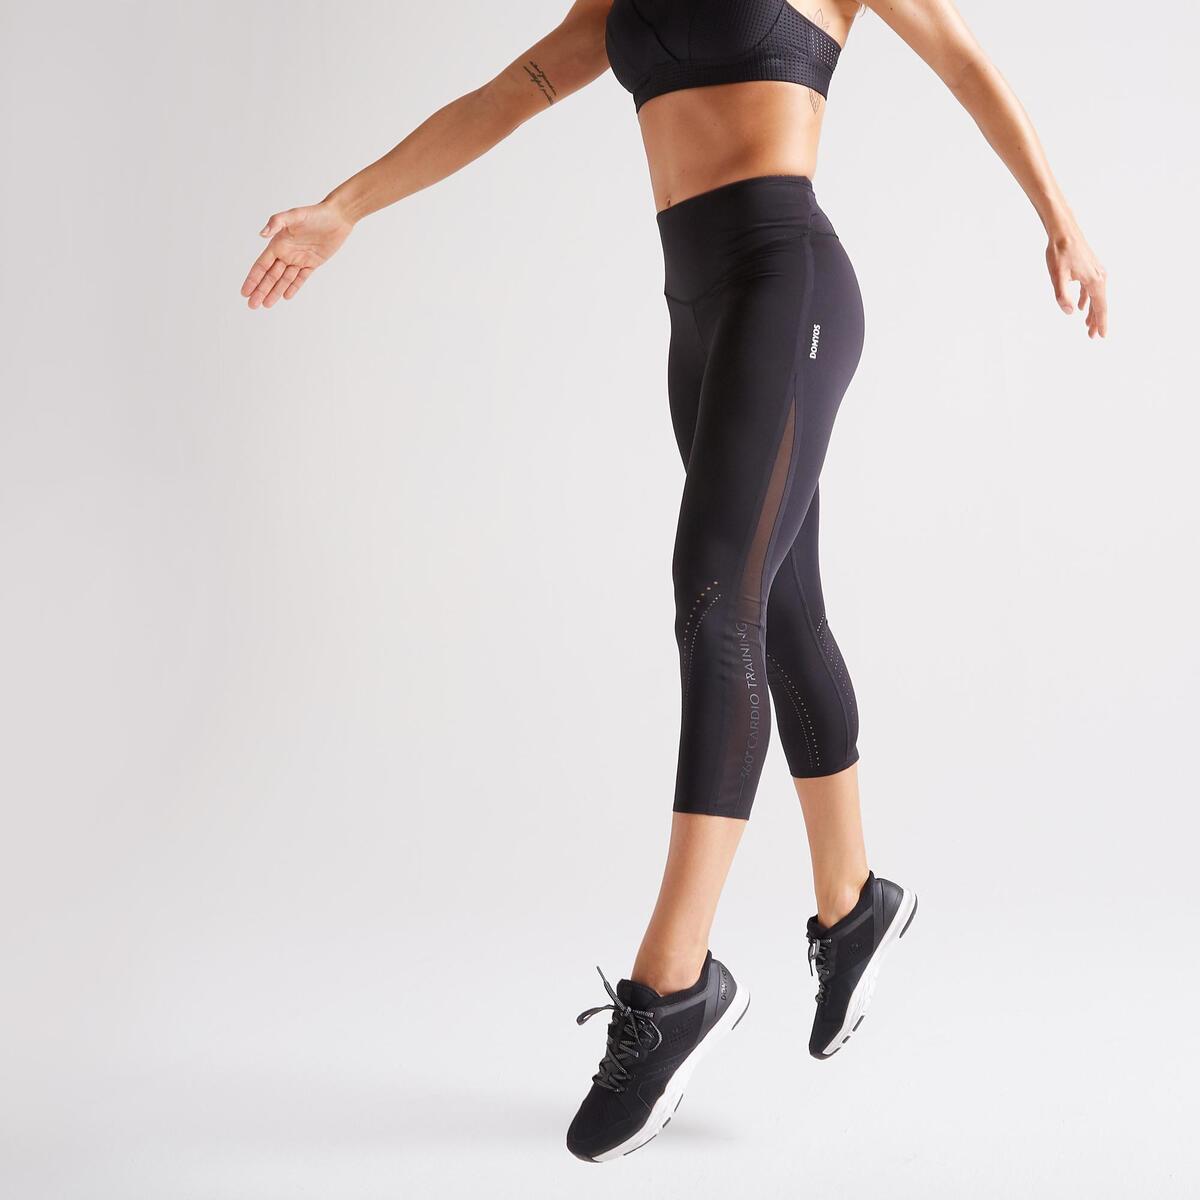 Bild 1 von 7/8-Leggings FLE 900 Fitness Cardio Damen schwarz